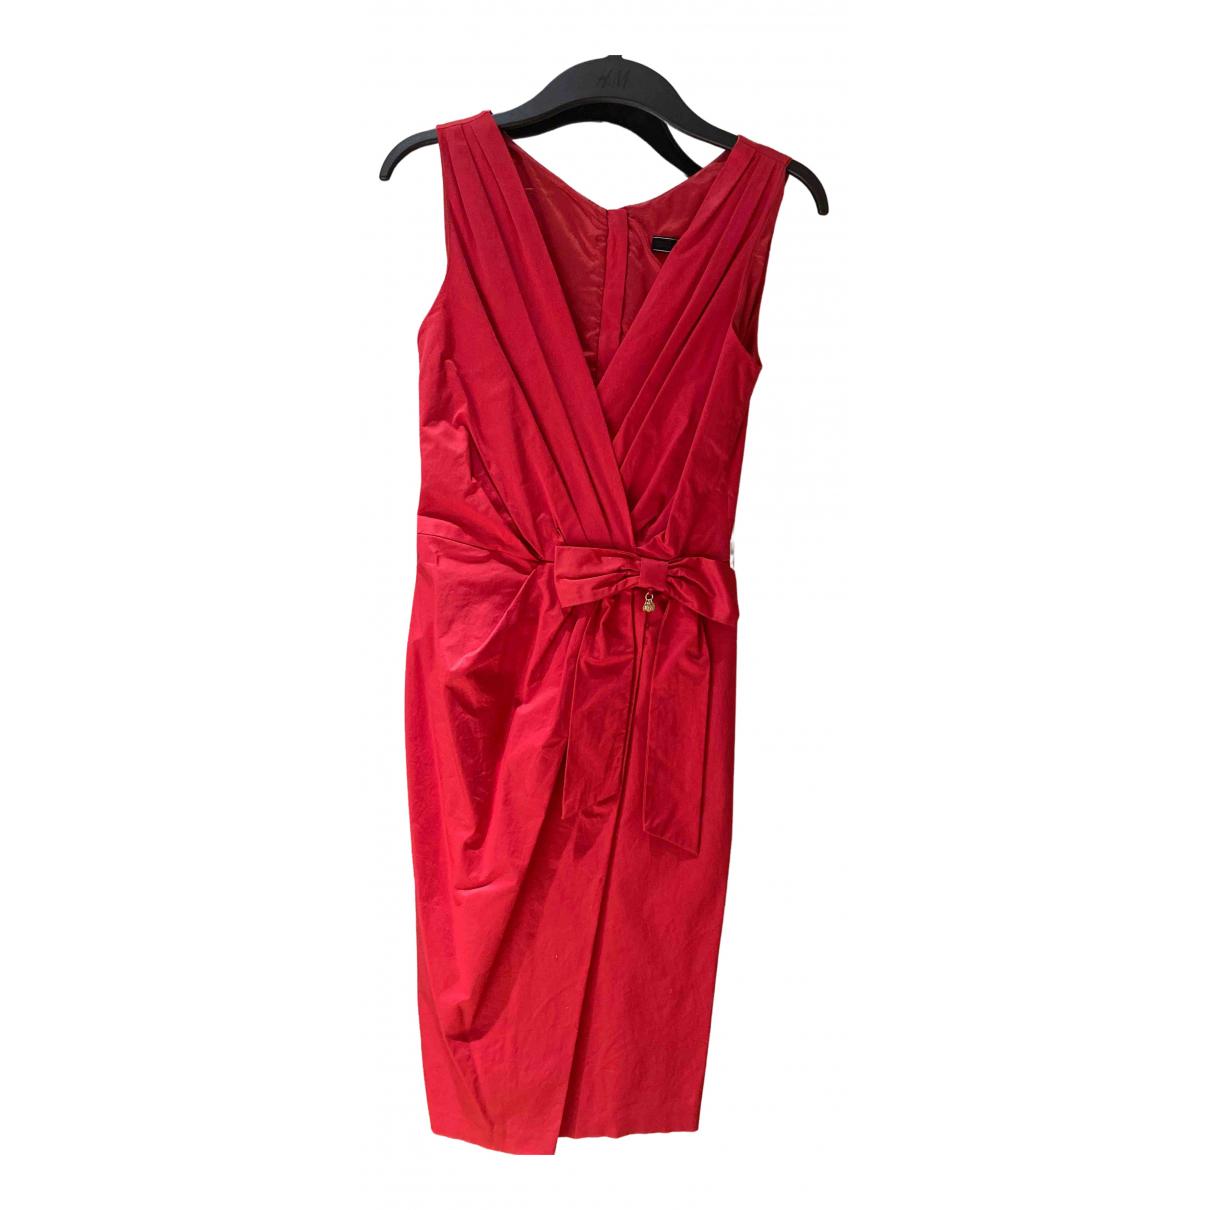 Elisabetta Franchi N Pink Cotton dress for Women 38 IT